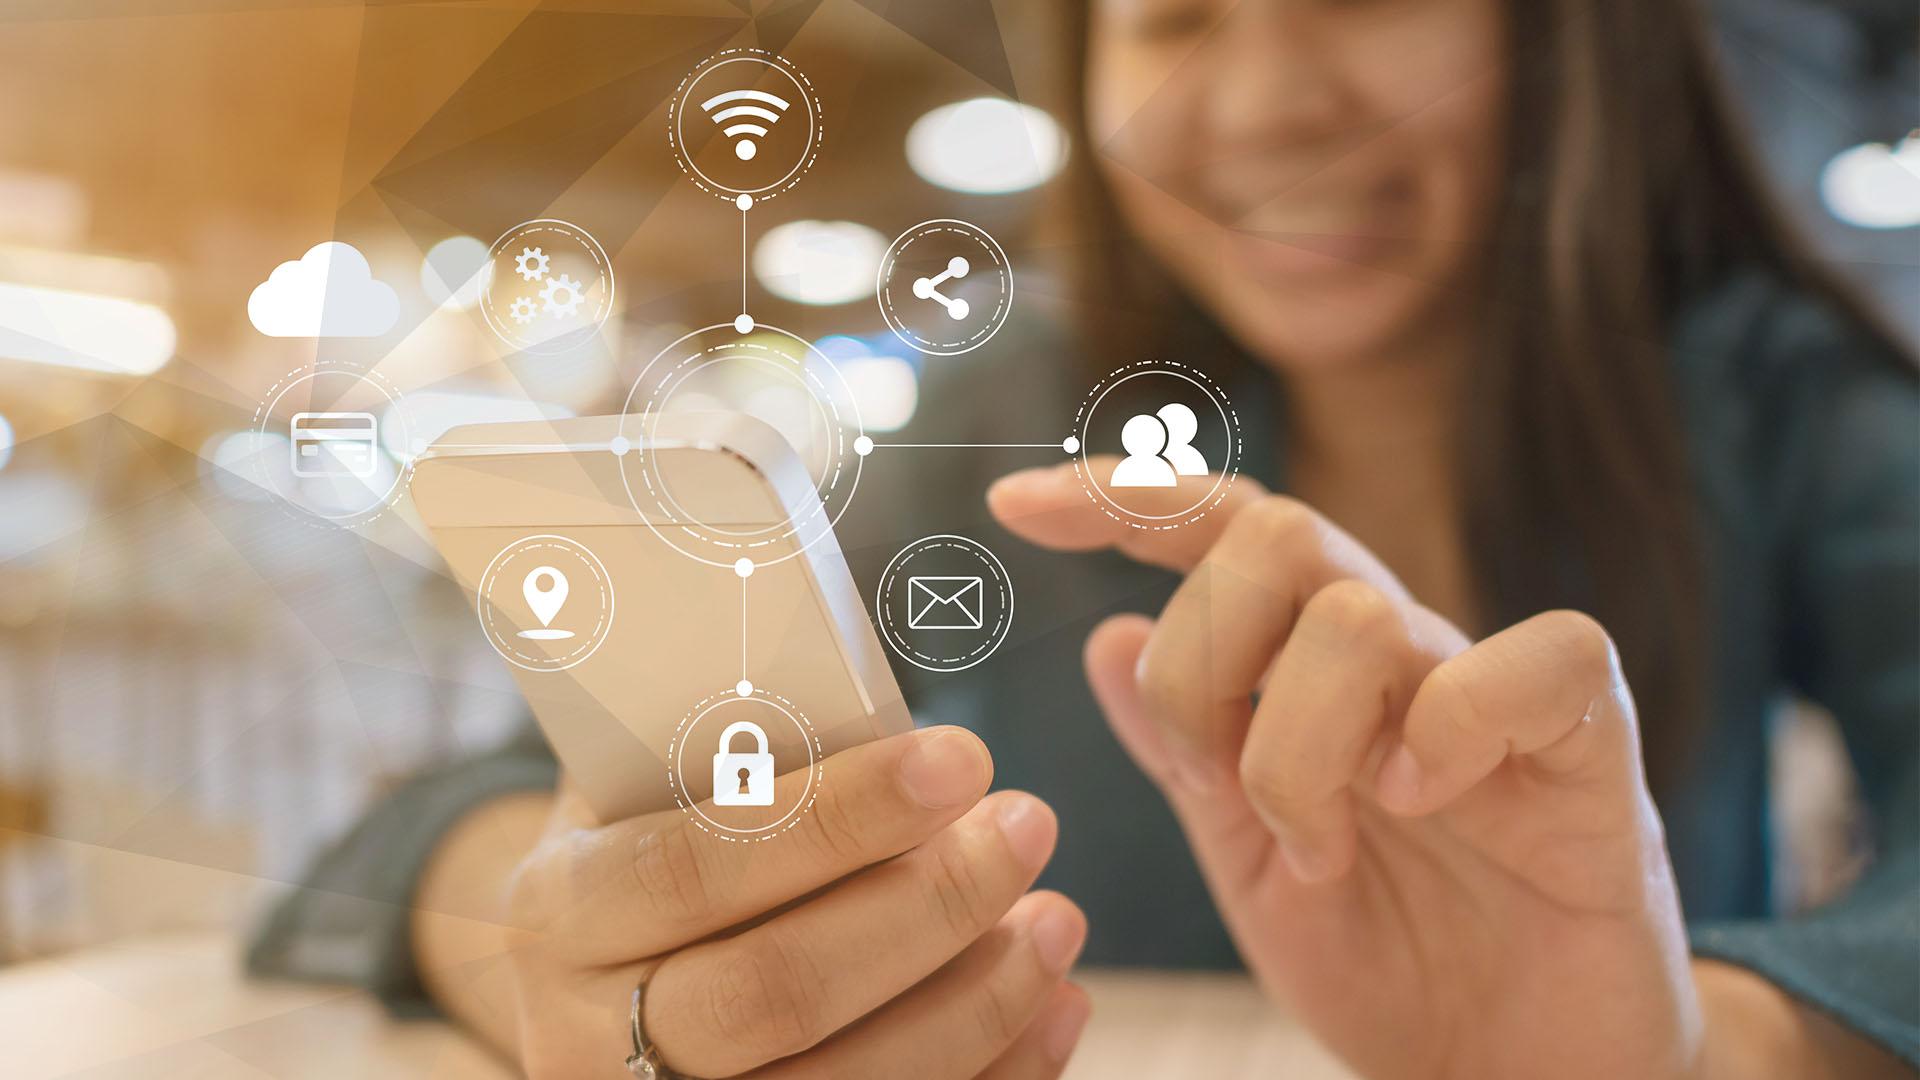 Smartphone, Smartphones, Mobilfunk, Handy, Wlan, Telefonie, Telefon, WiFi, Wireless, Telekommunikation, Telefonieren, Hotspot, Kontakte, Wlan Hotspot, Frau, Teilen, Hände, Wireless LAN, WifiSpot, Share